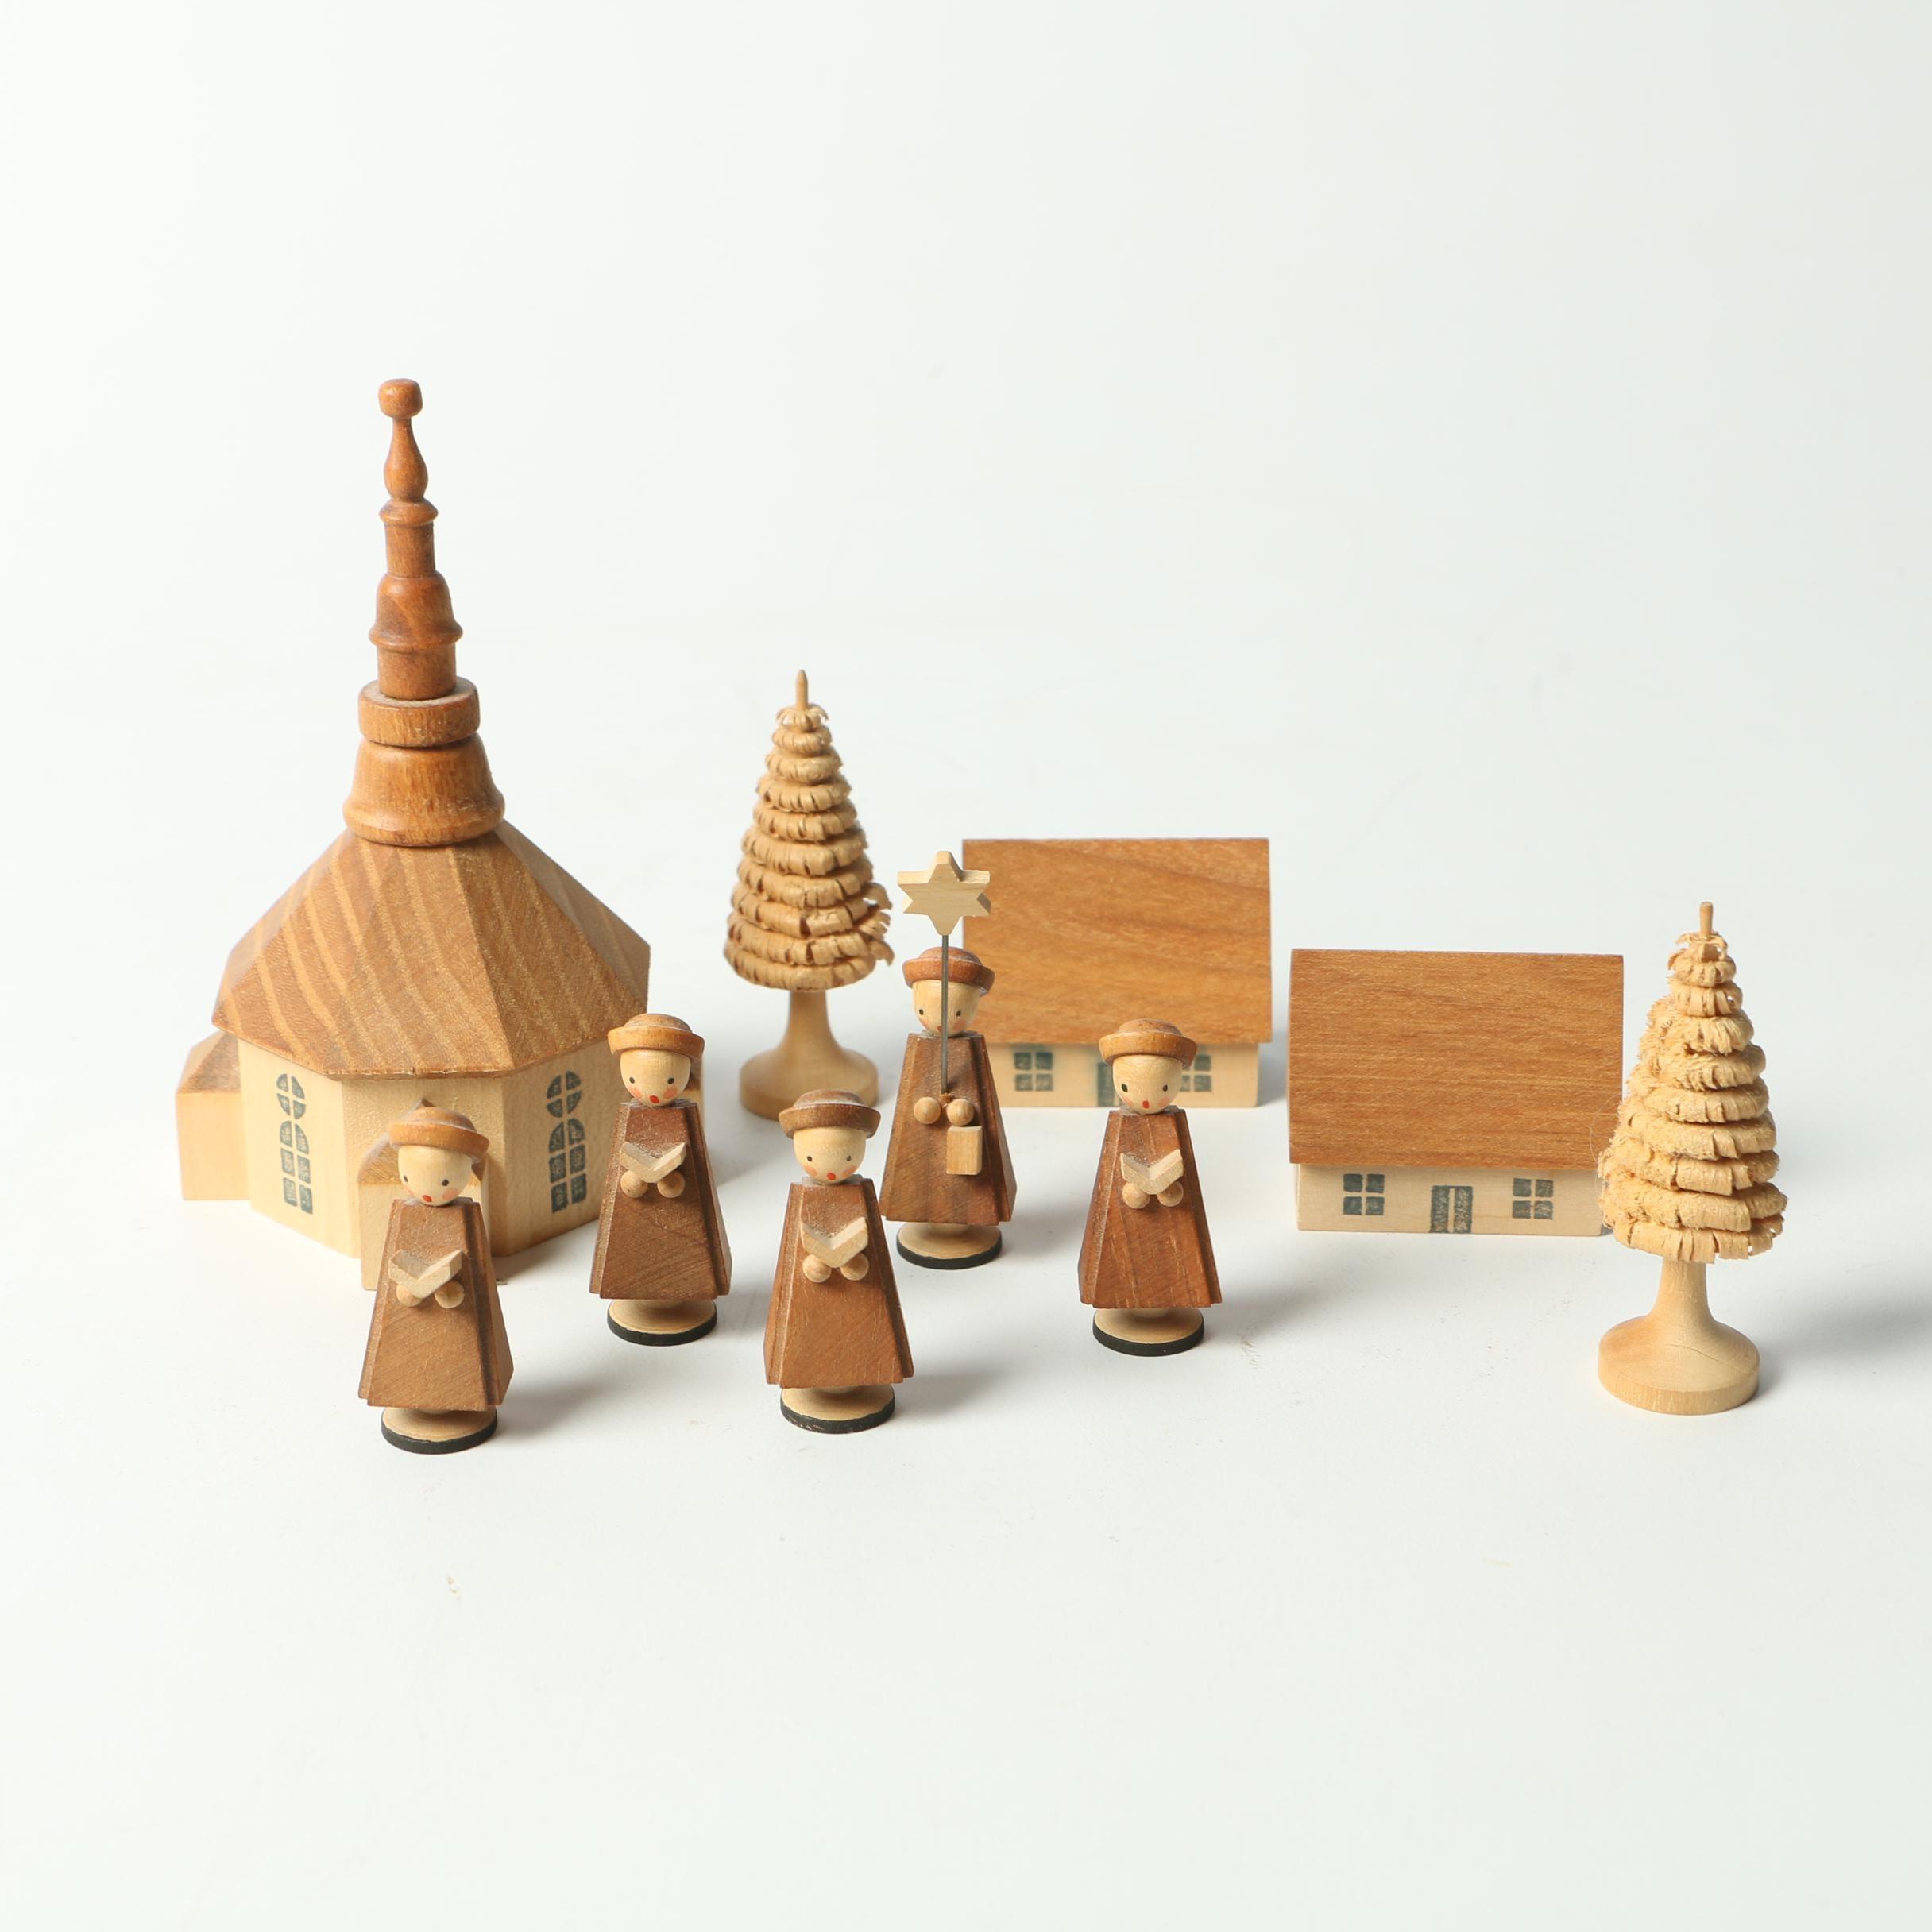 Vintage East German Carved Wooden Christmas Carolers and Village Figurines